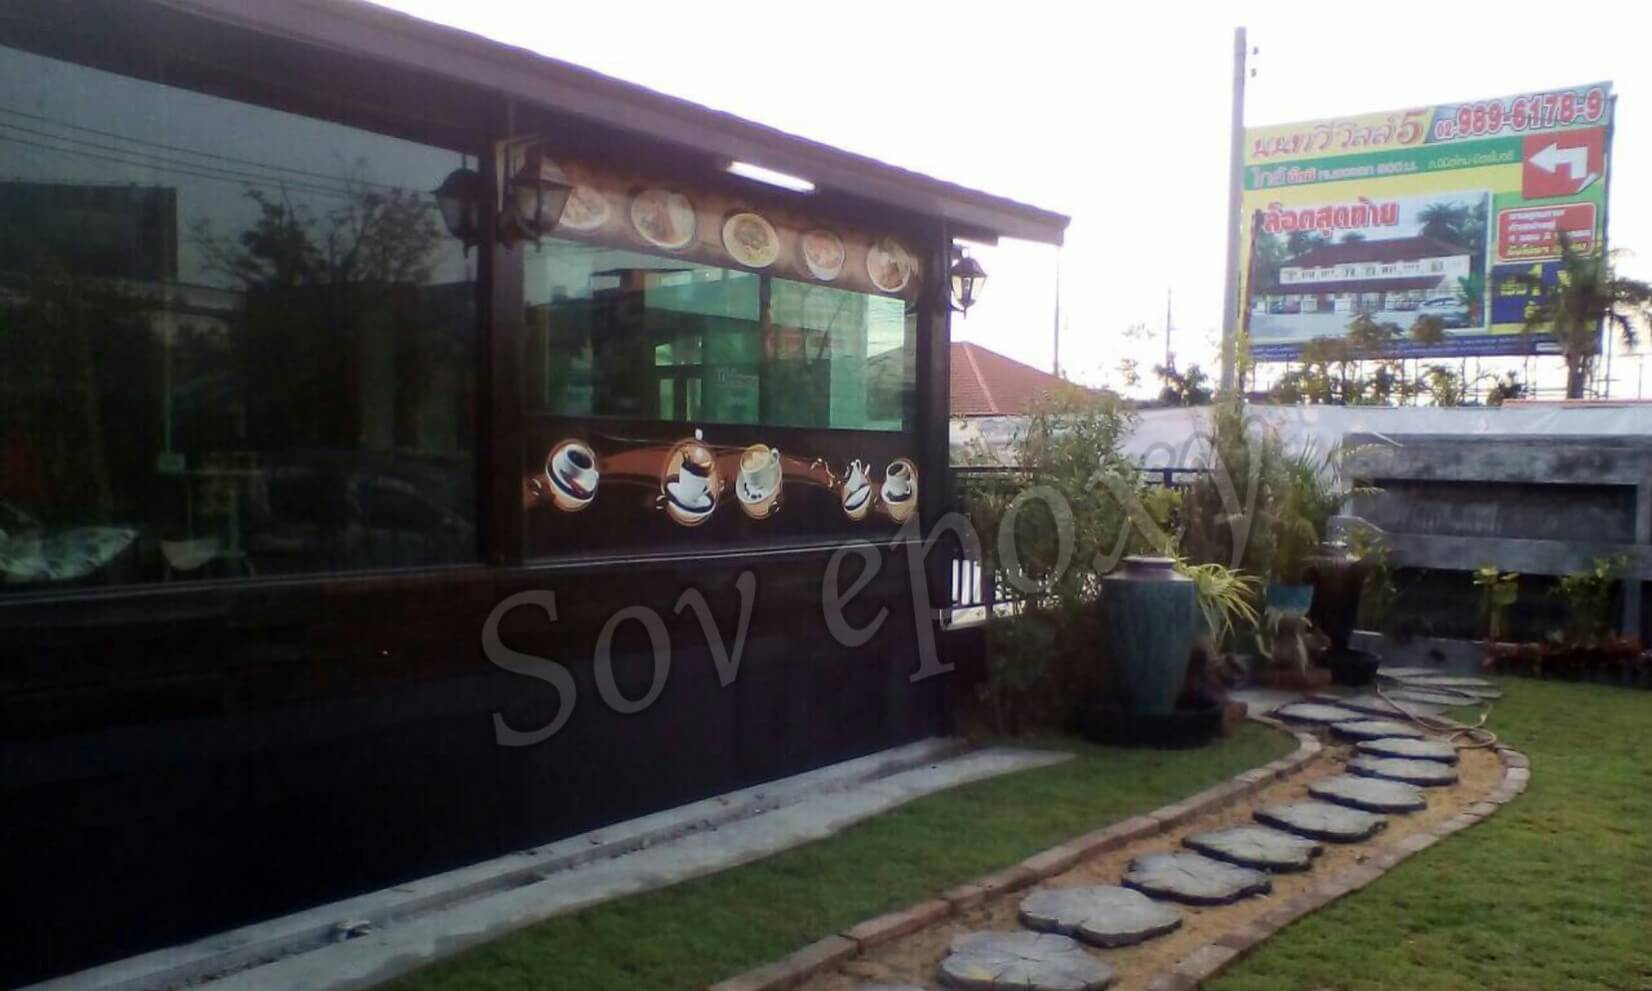 SOV & Coffee Chill เปิดให้บริการ วันจันทร์ 30/01/60 นี้ 20